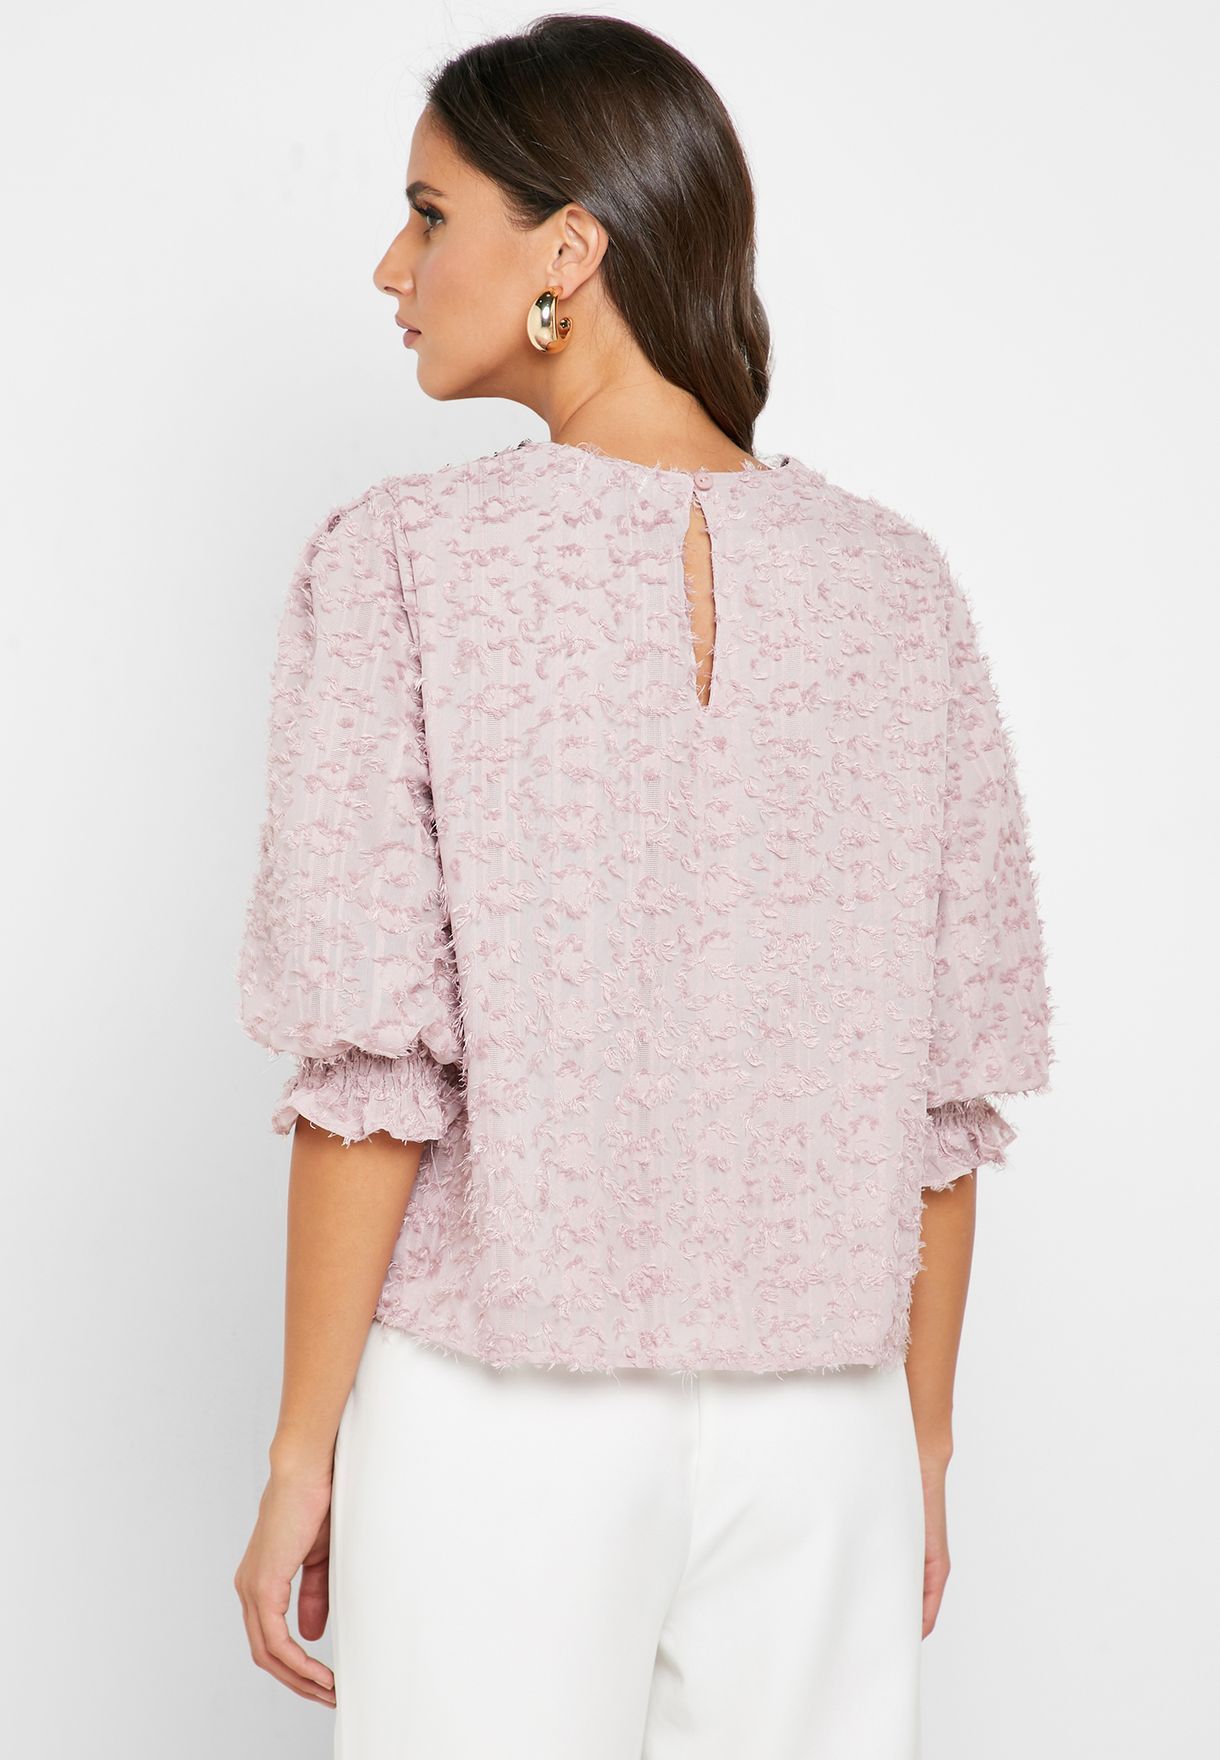 Textured Puffed Sleeve Top